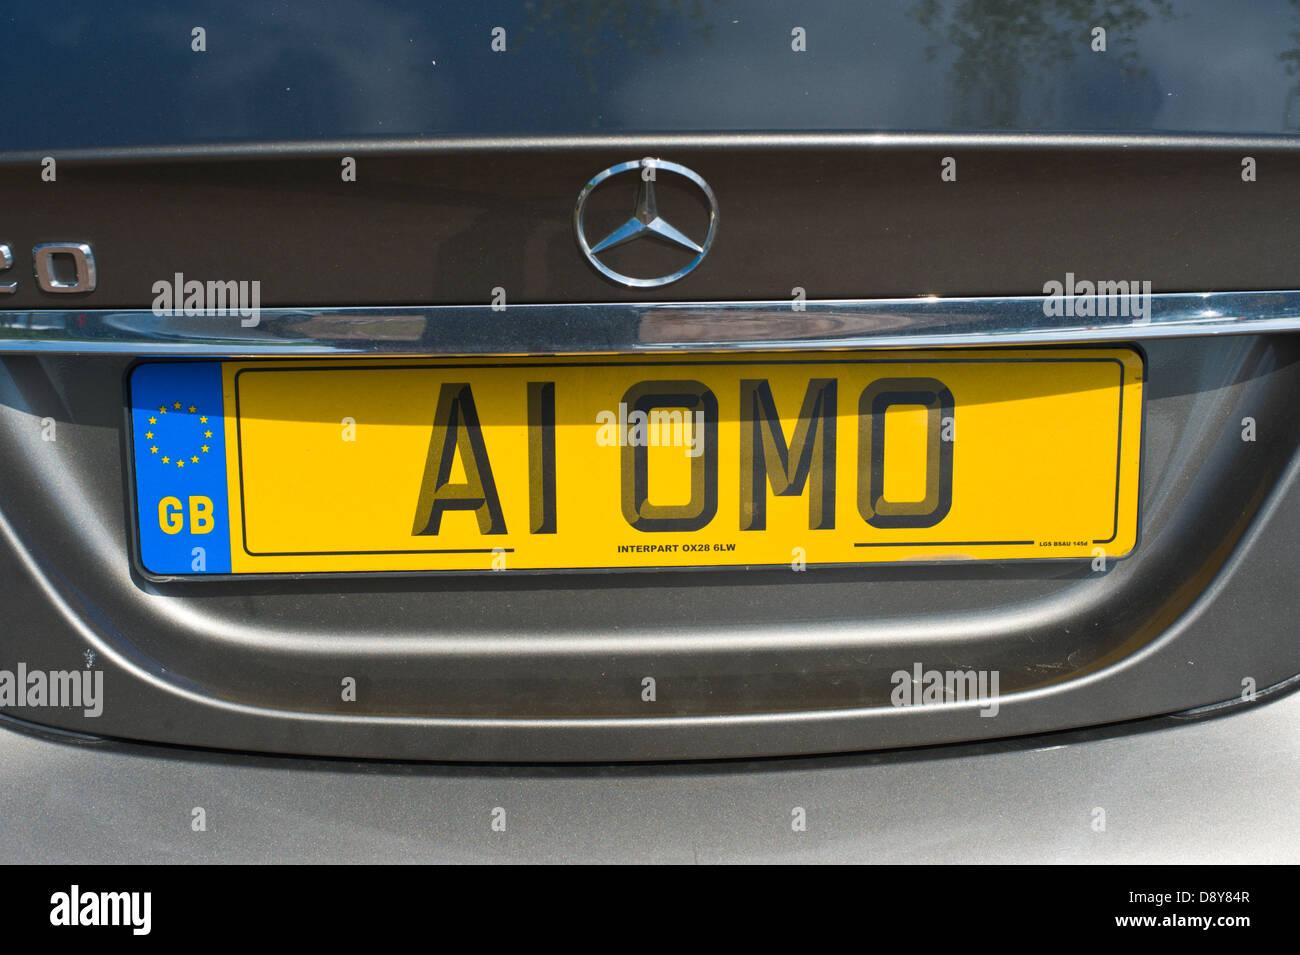 Personalised Plate Stockfotos & Personalised Plate Bilder - Alamy